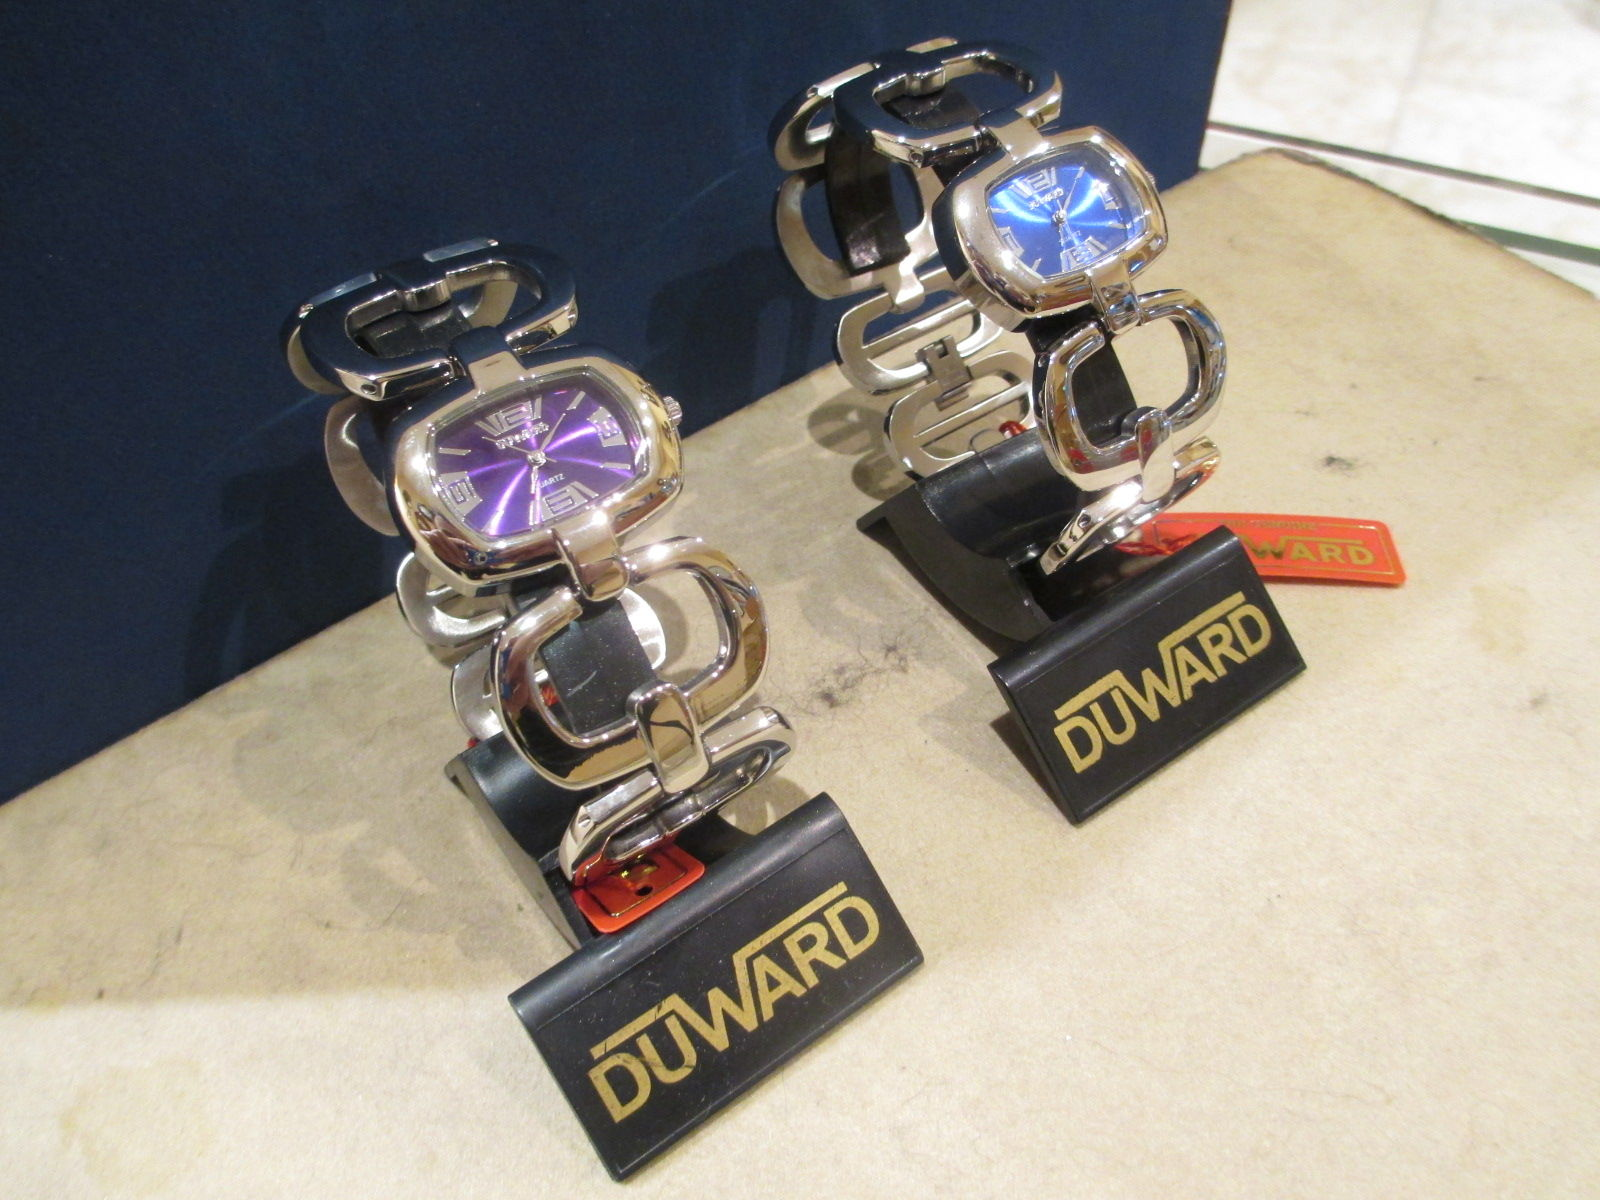 relojes Duward correa estilo pulsera